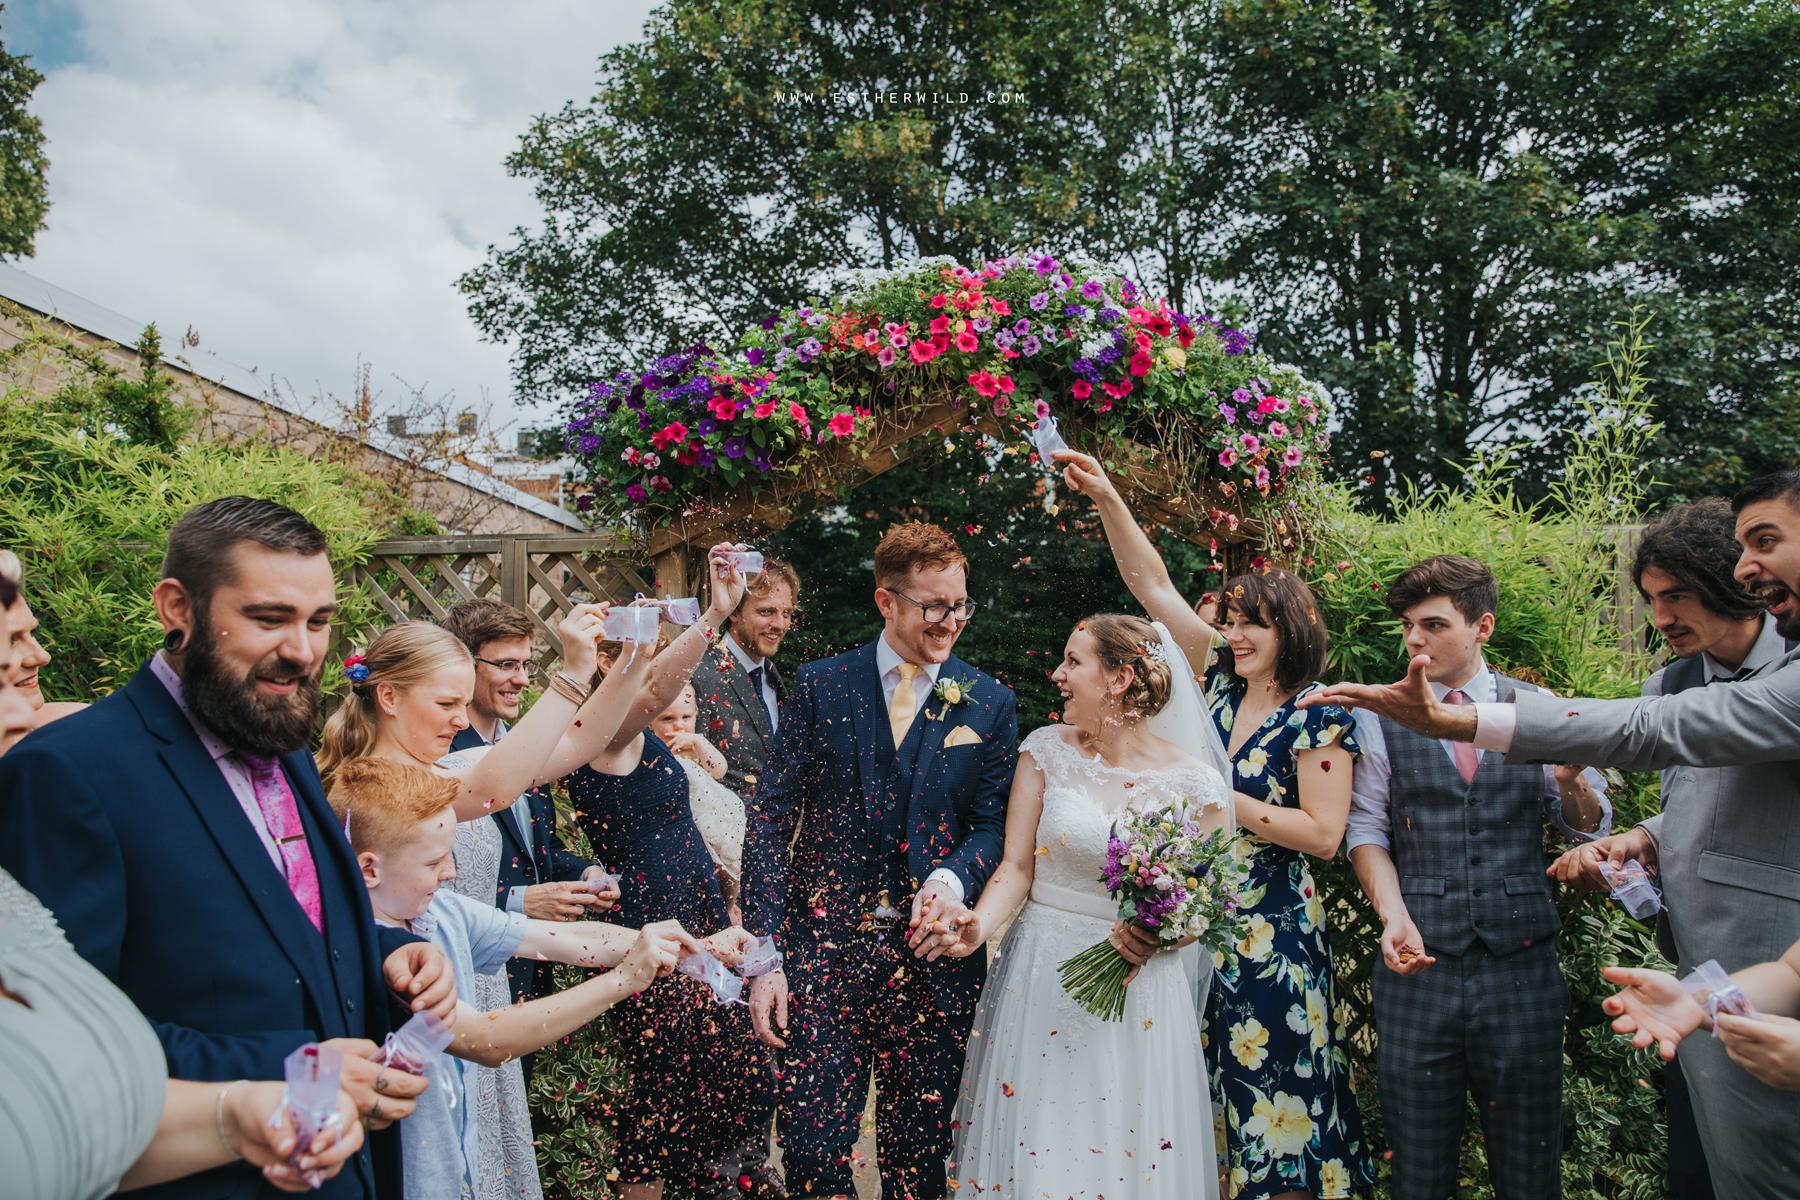 The_Georgian_Townhouse_Wedding_Norwich_Esther_Wild_Photographer_3R8A1315.jpg